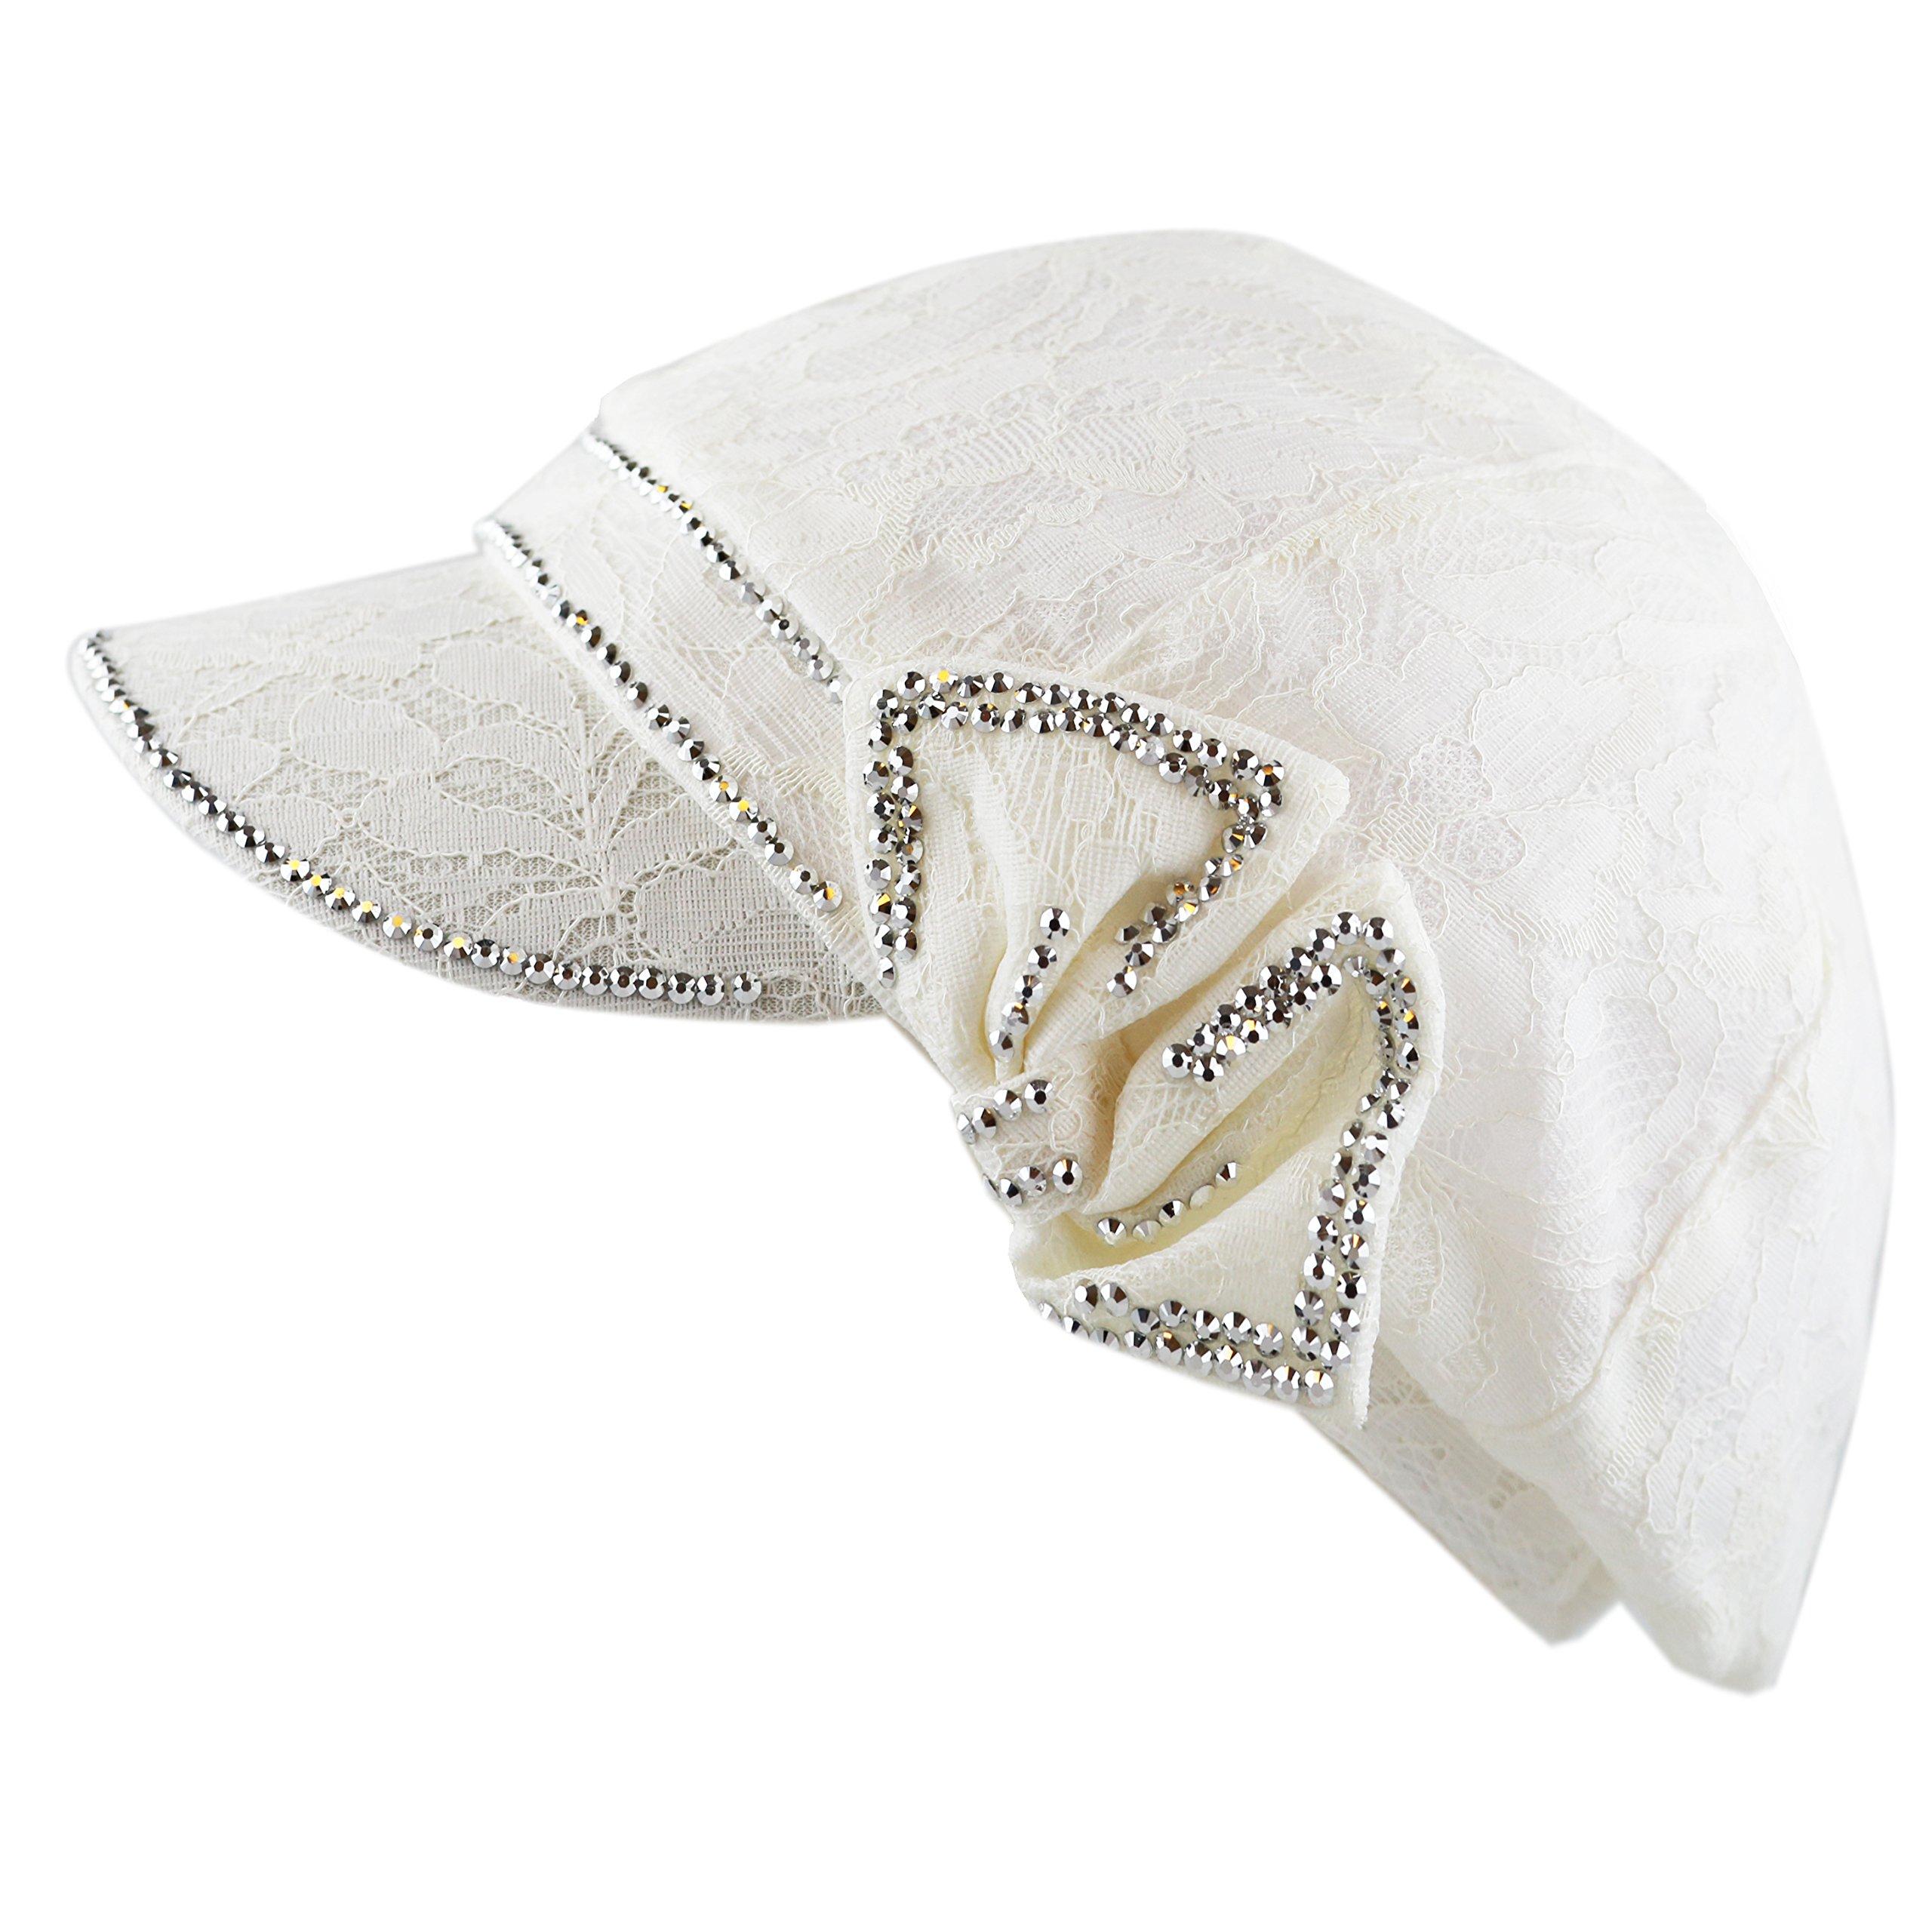 69279b67cddef THE HAT DEPOT 200H4199 Womens Cool Flower Mesh Pattern Shiny Studded  Applejack Hat product image